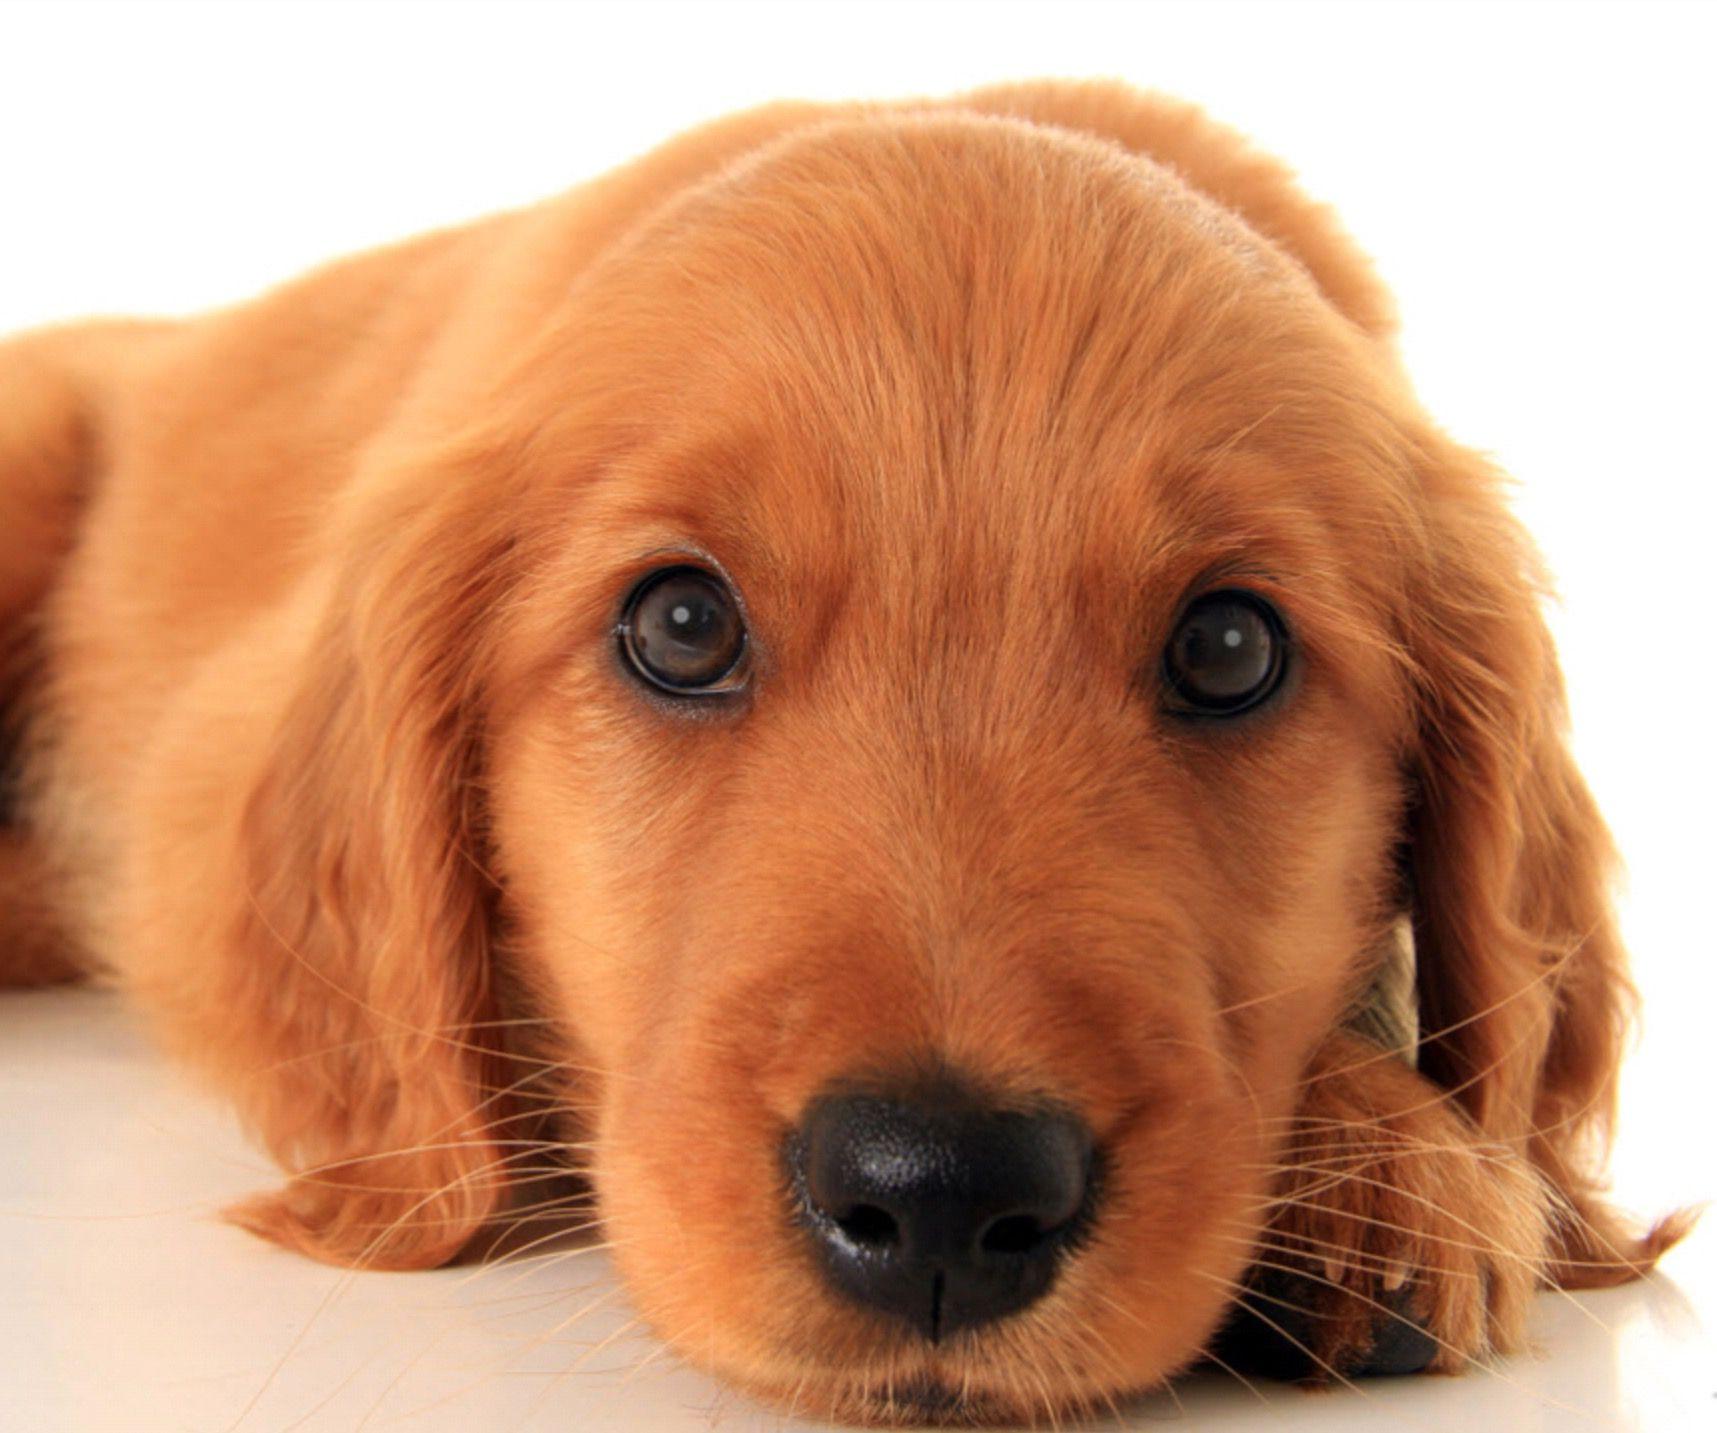 Golden puppy L O V E ♥️ Emotional support animal